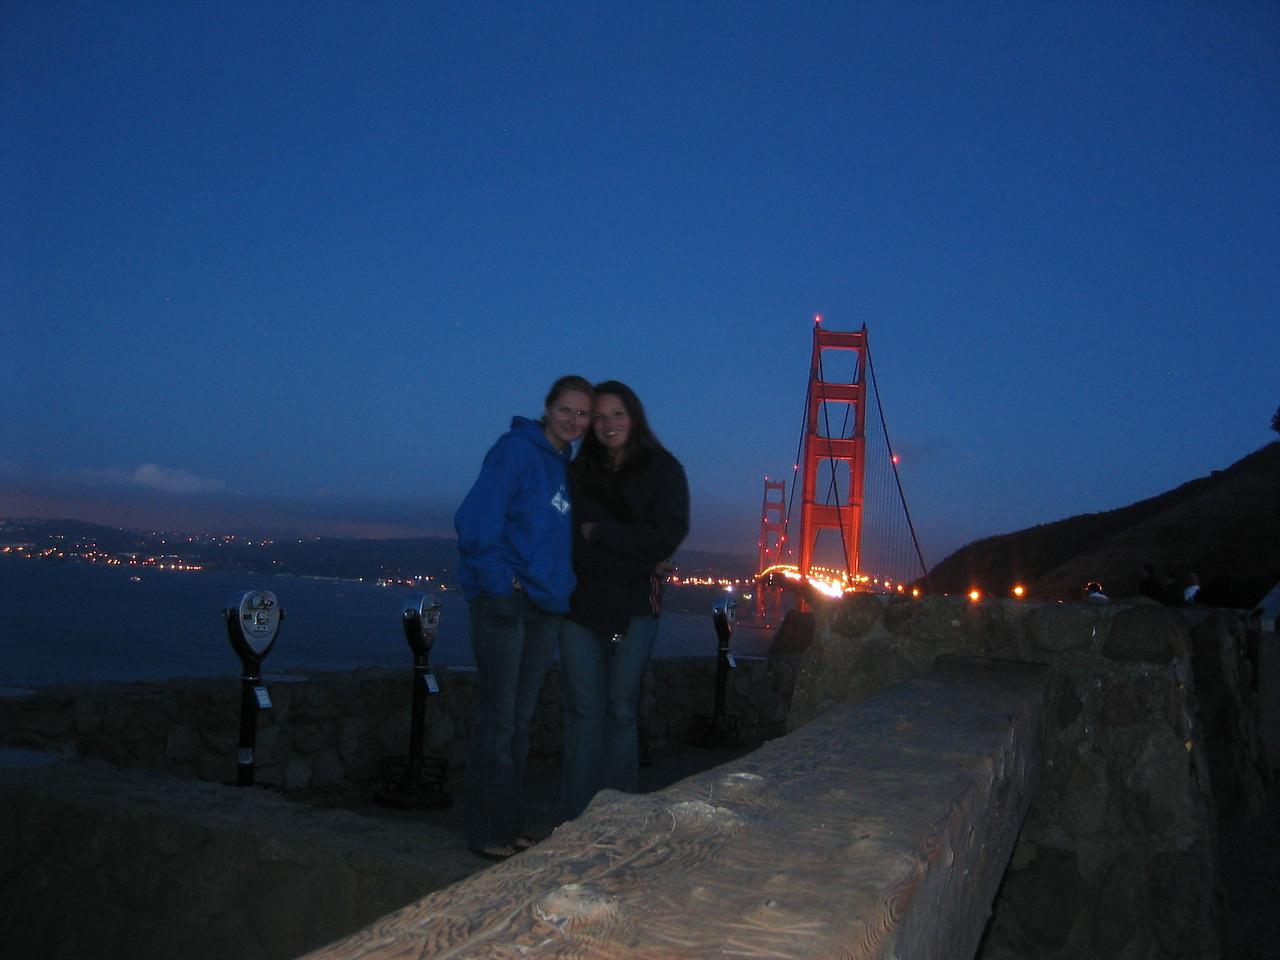 2004 07 12 Monday - Melody Cline & Carrie @ Golden Gate Bridge vista 1